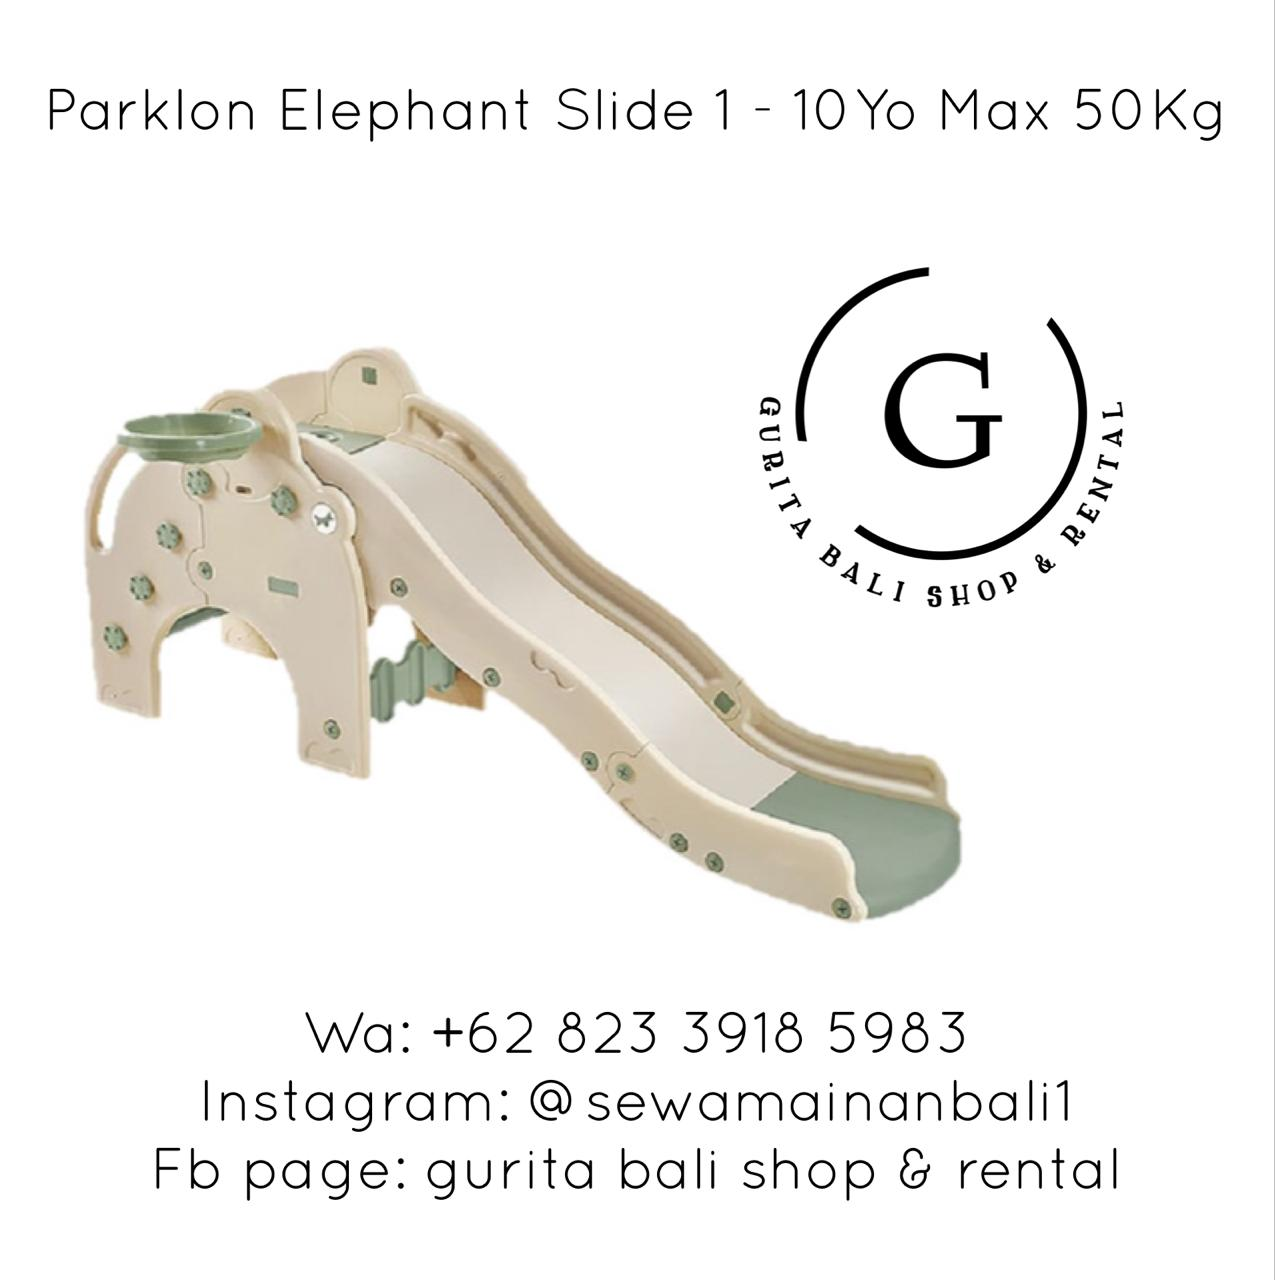 PARKLON ELEPHANT FUN SLIDE 1